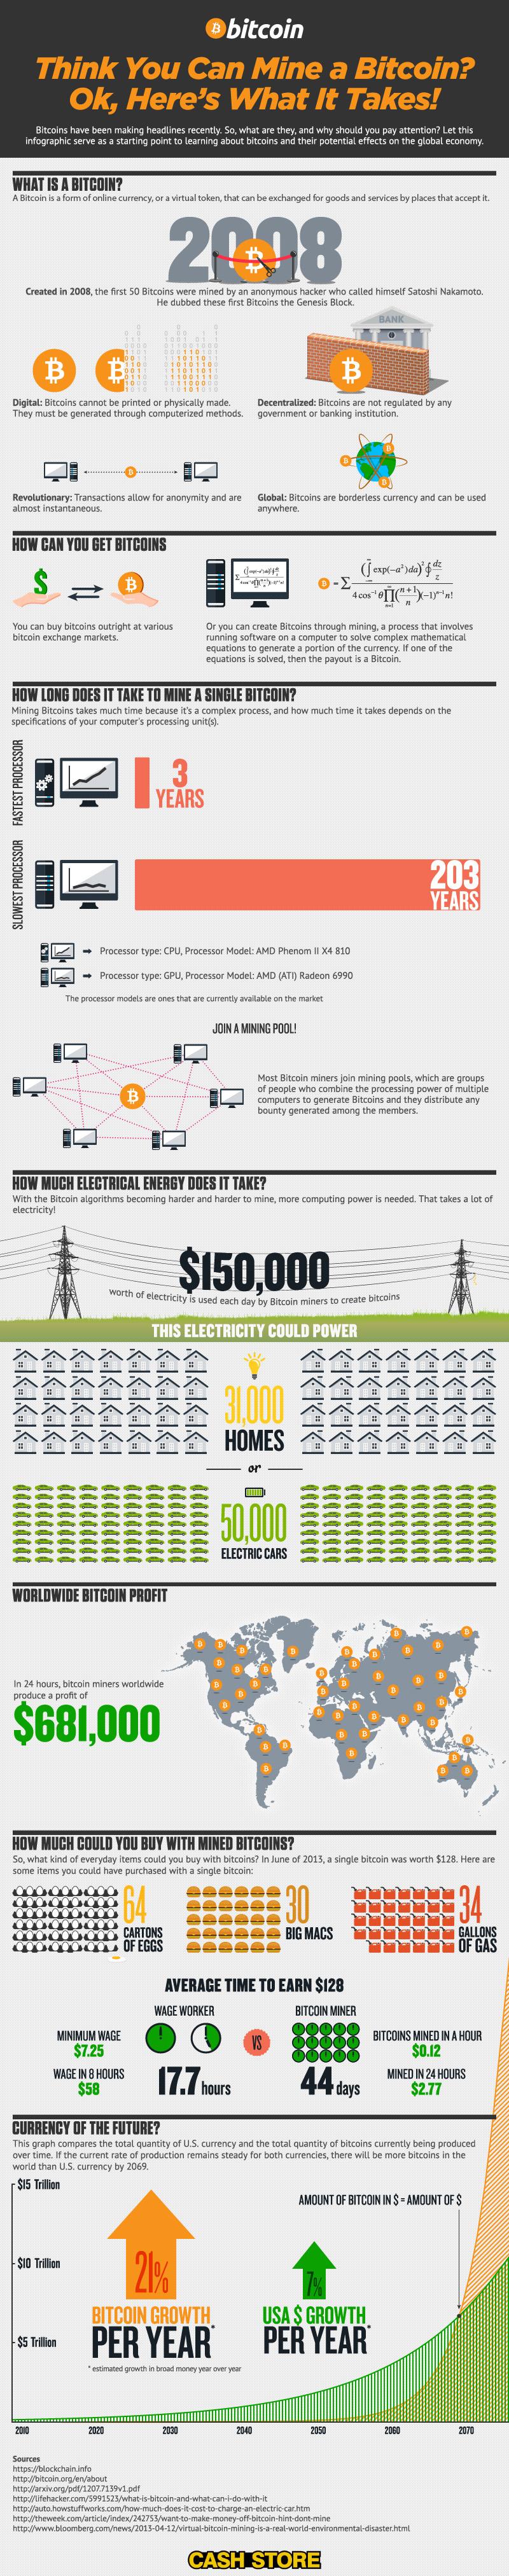 Bitcoin wallets vs bank accounts graphic bitcoin httponbitcoinwp contentuploads20130920130903 bitcoin mining infographicg ccuart Gallery